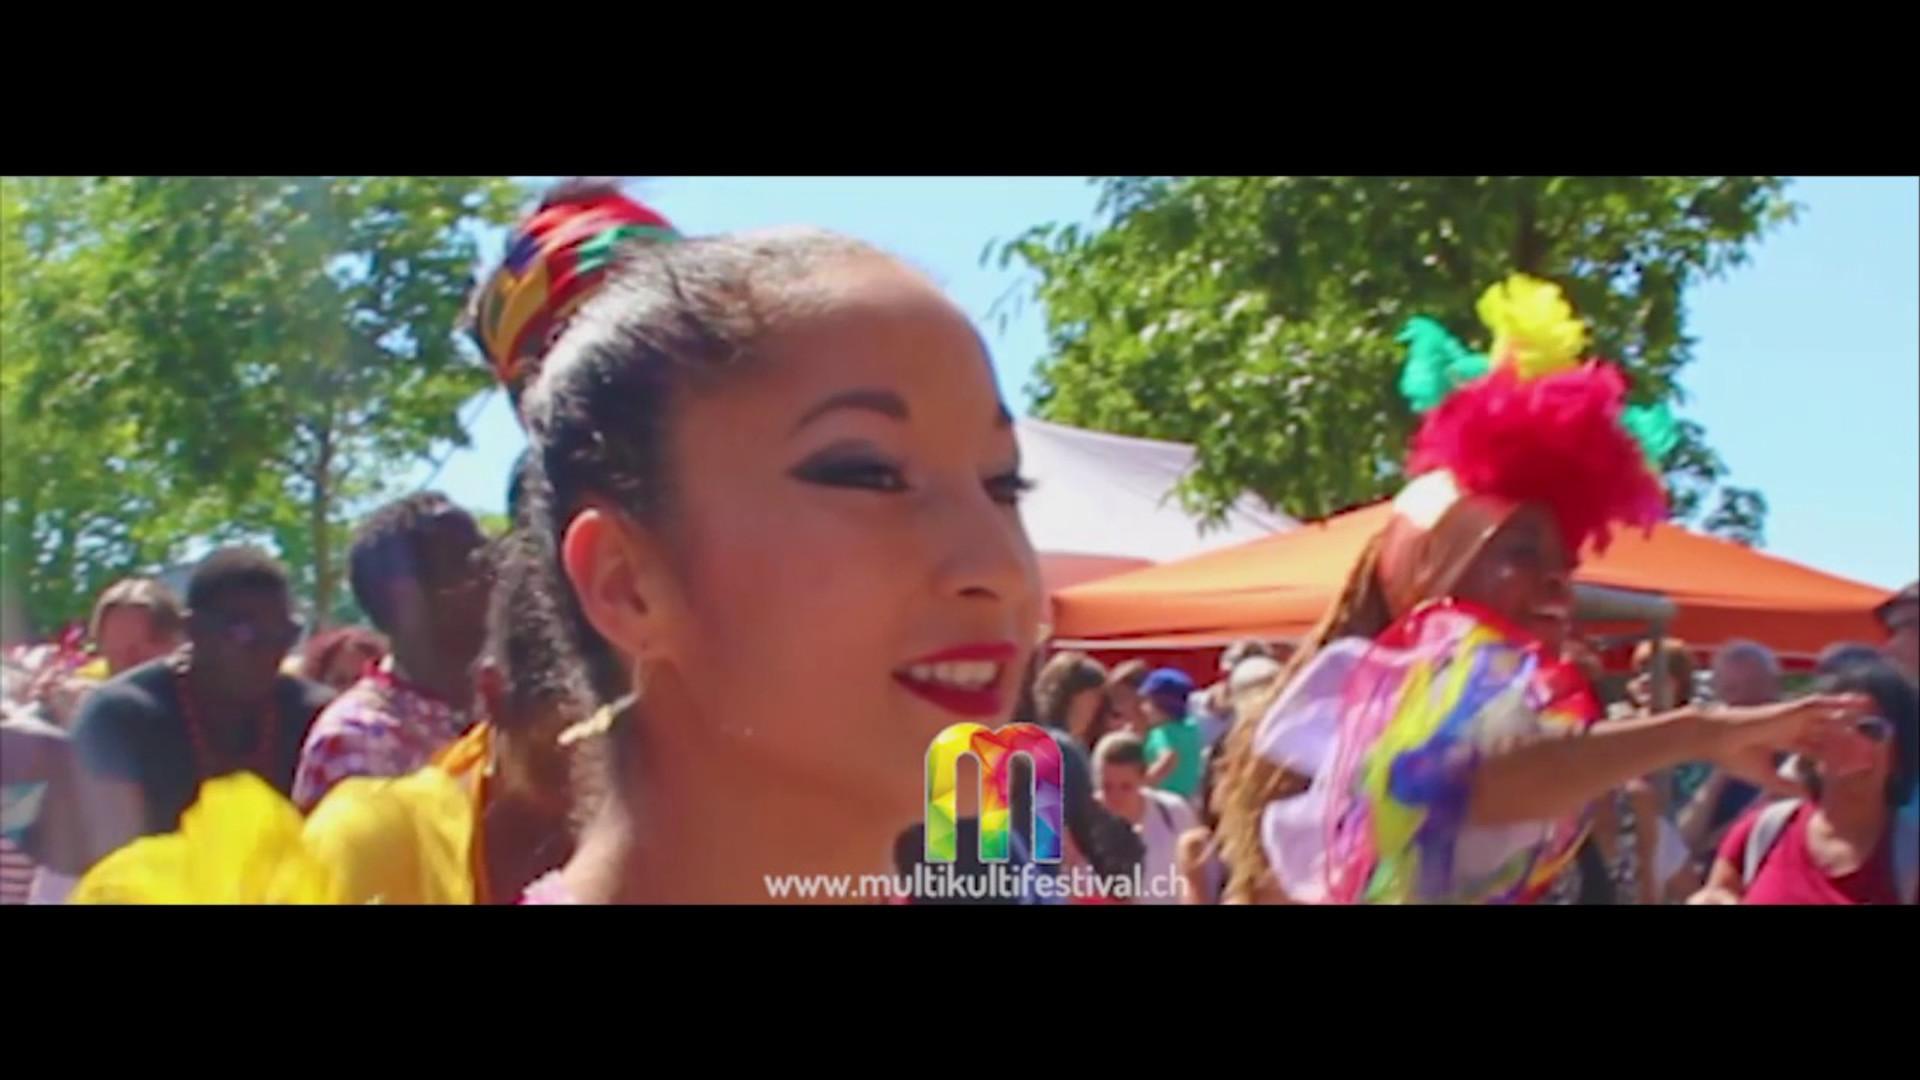 Festival der Kulturen - Conga Parade